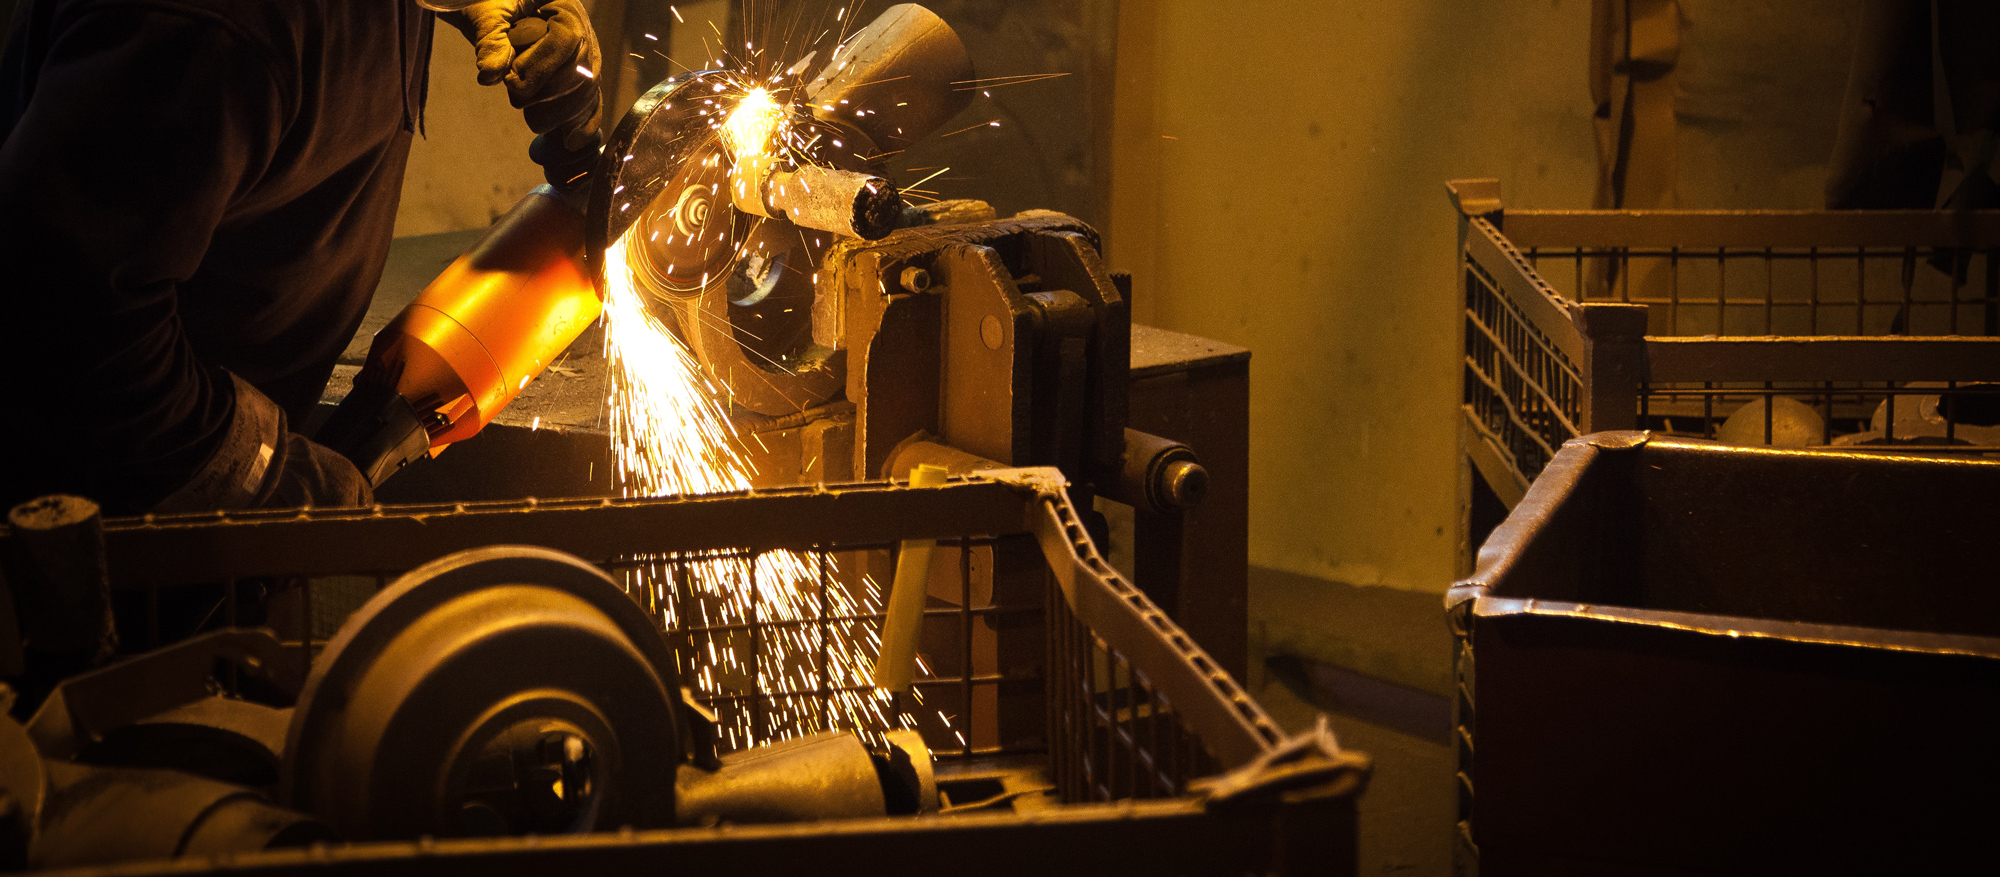 Rugui Brights US Steel